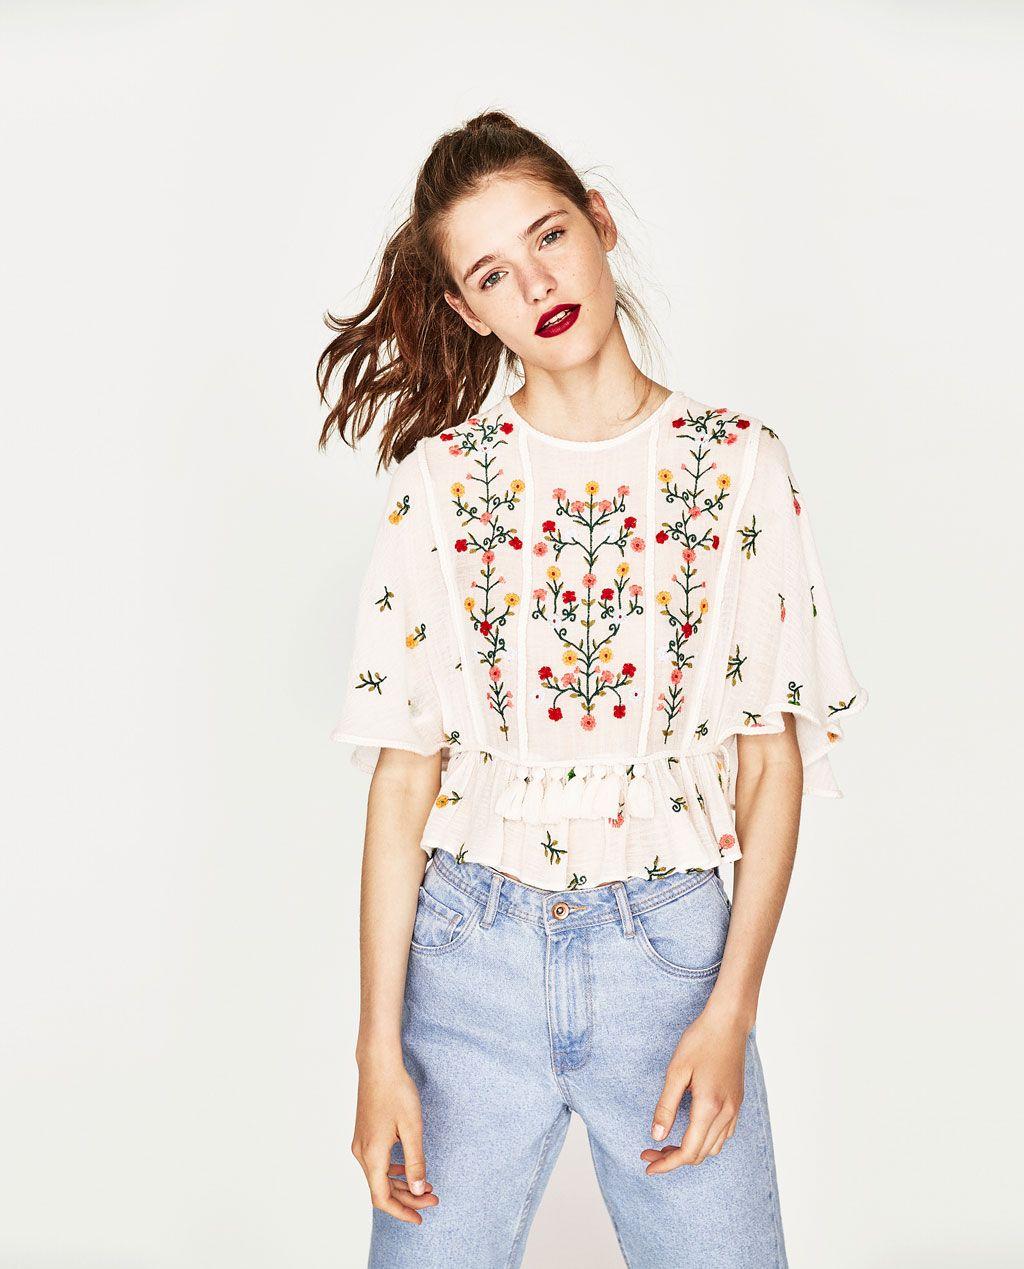 Pin de Karen Julieth en 2018 Colorada | Pinterest | Bordado, Camisas ...